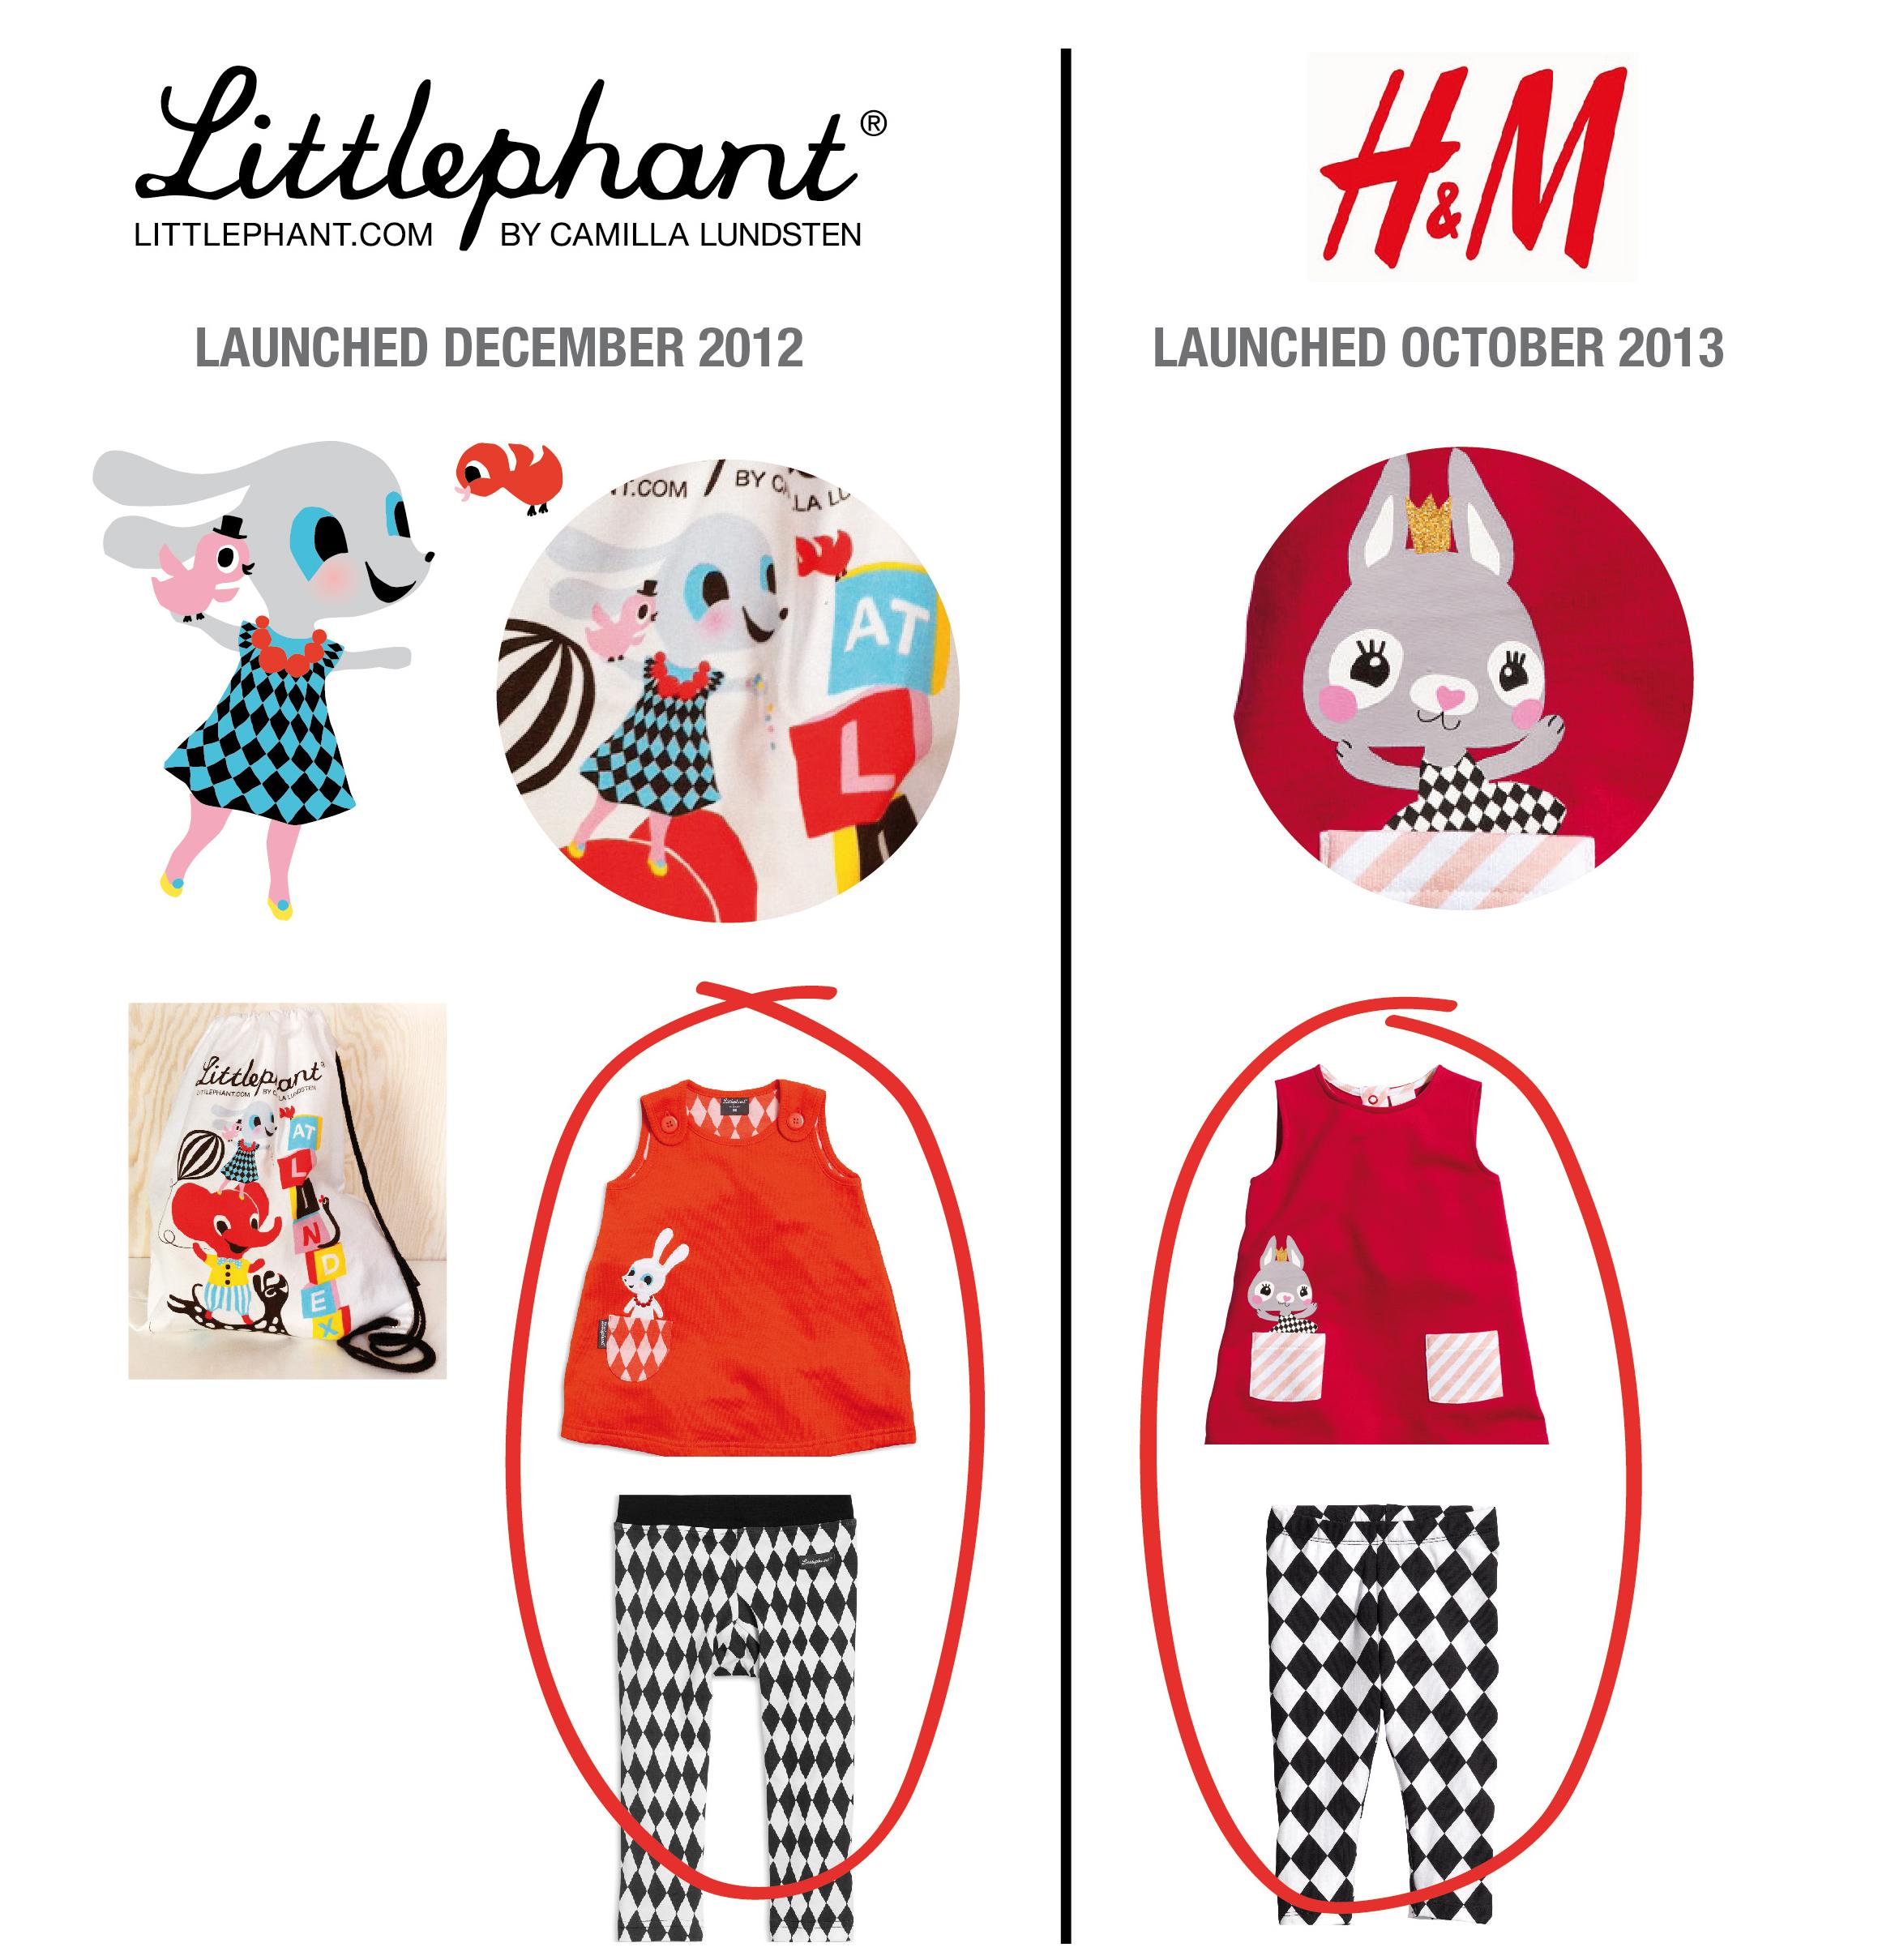 Littlephant_copyed by H&M_Newsletter